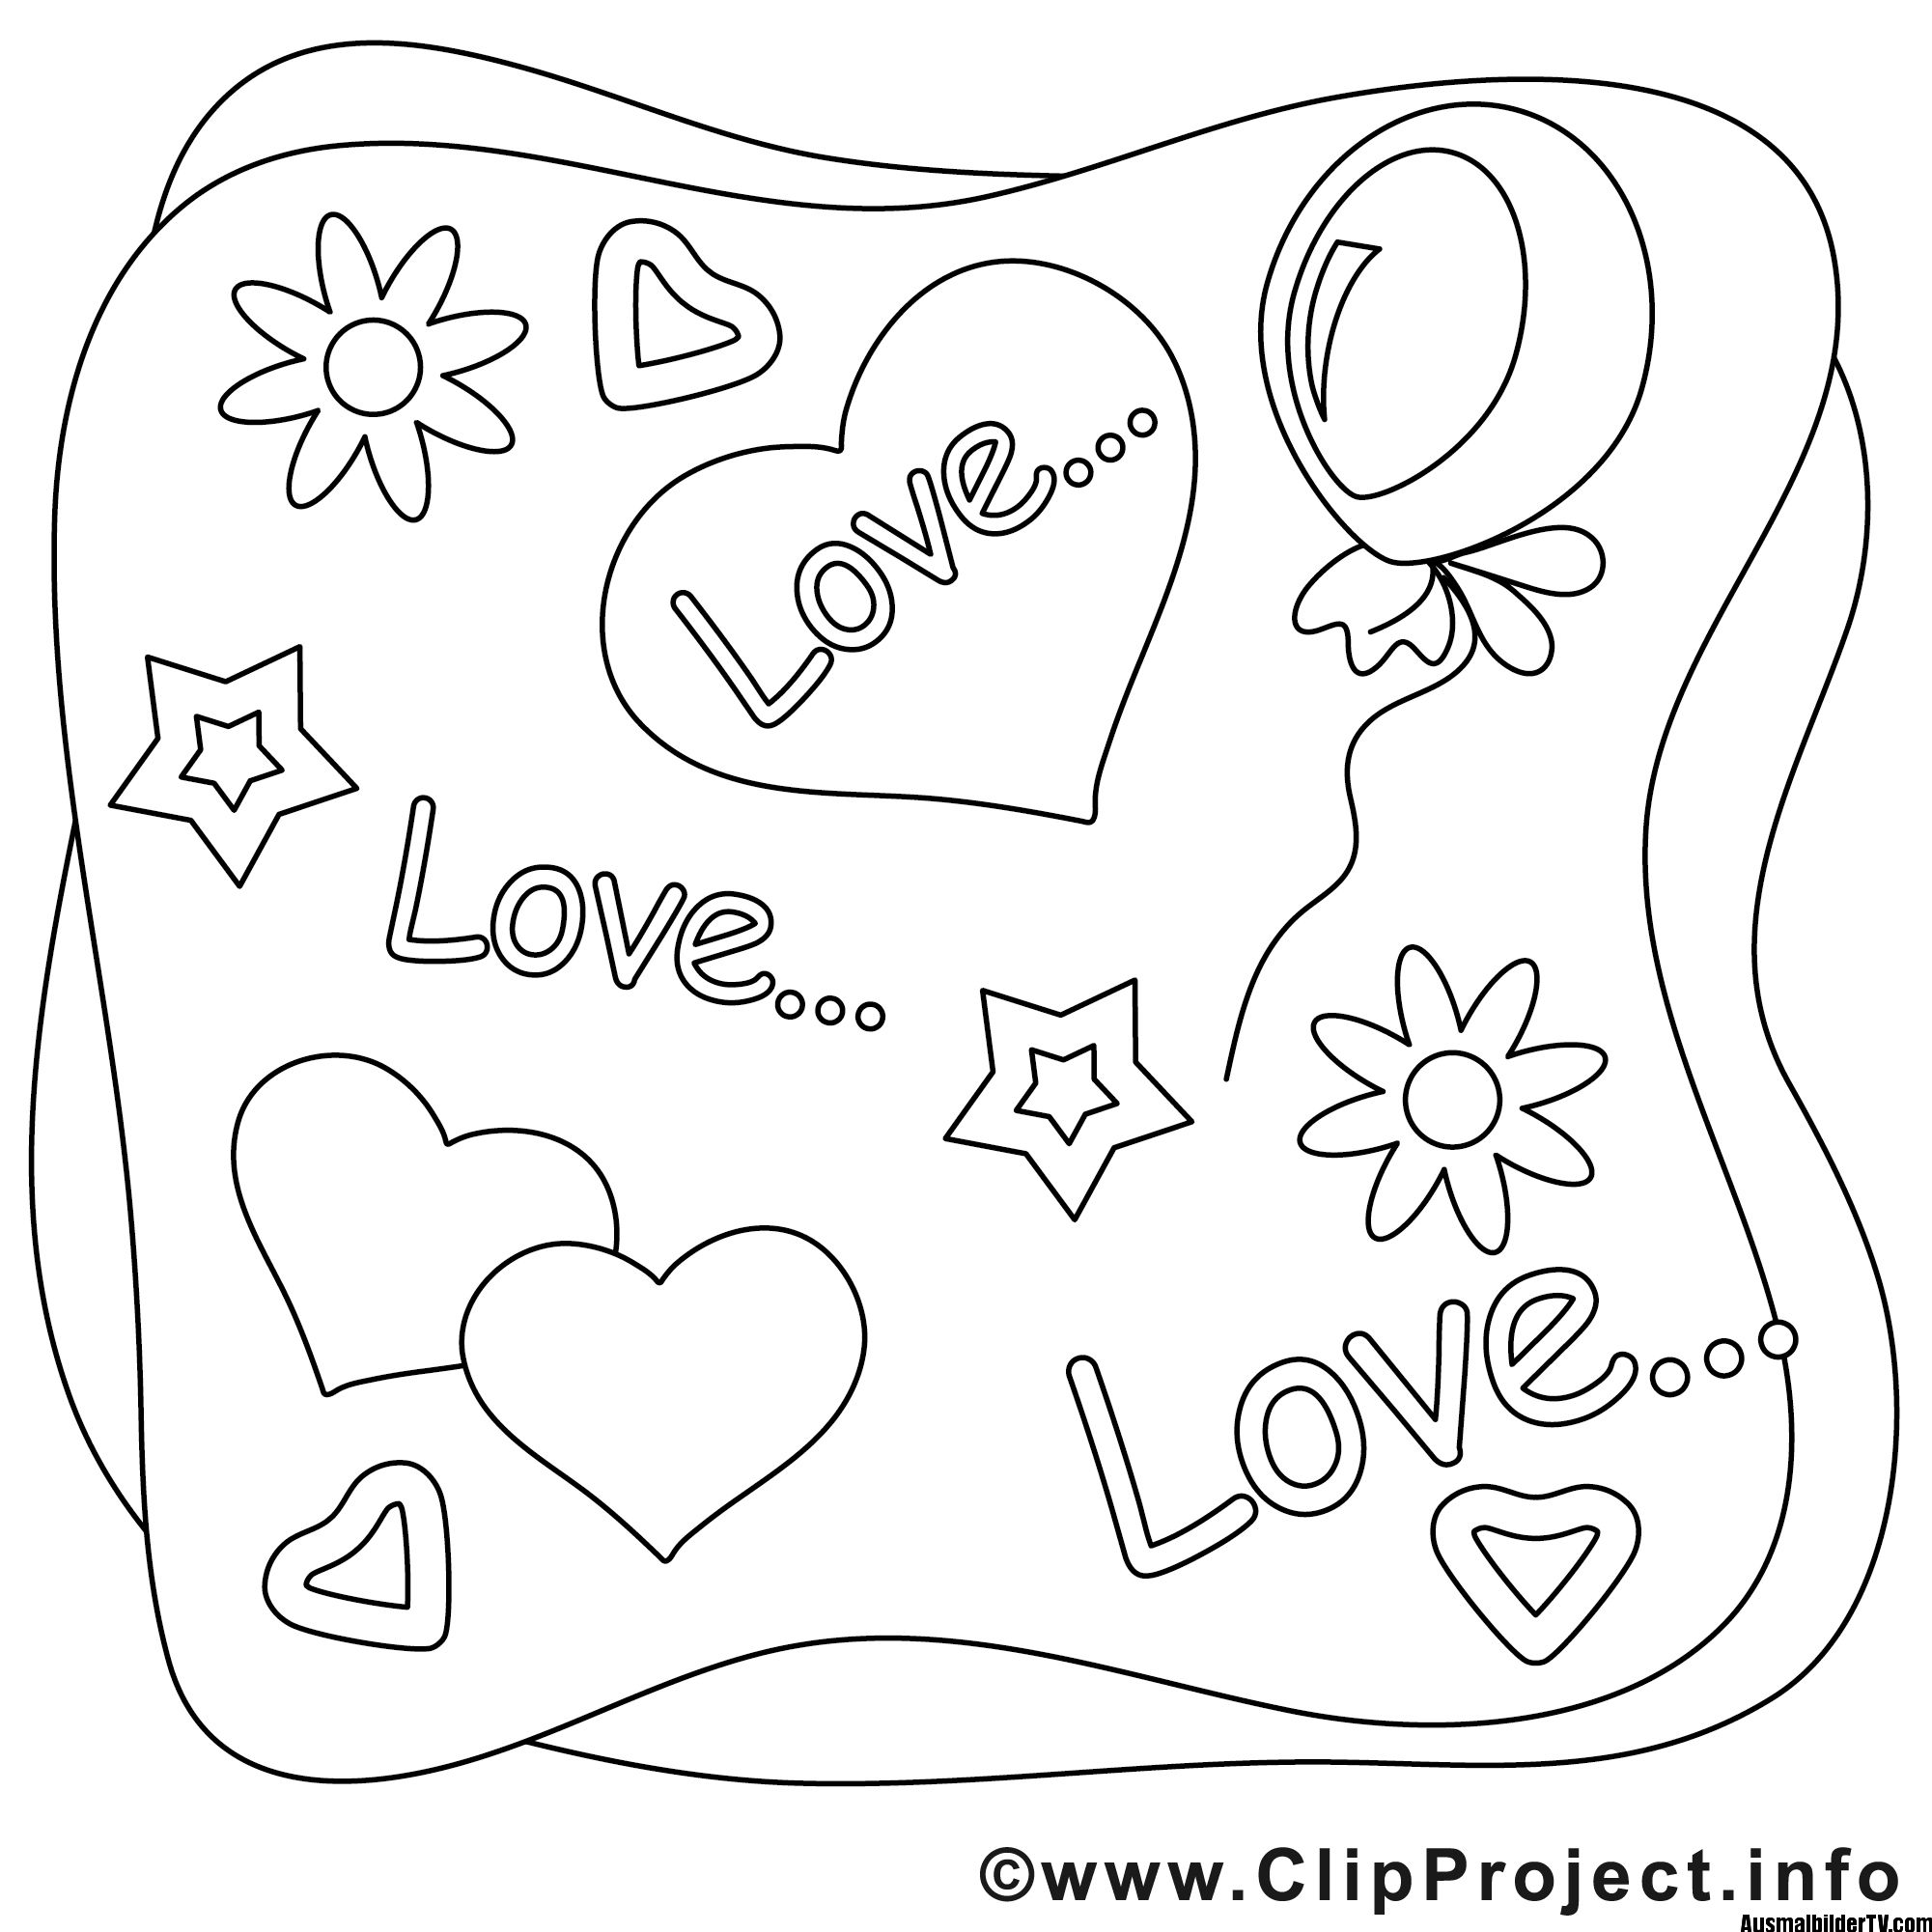 Love Ausmalbild - 1Ausmalbilder.com   Ausmalbilder ...